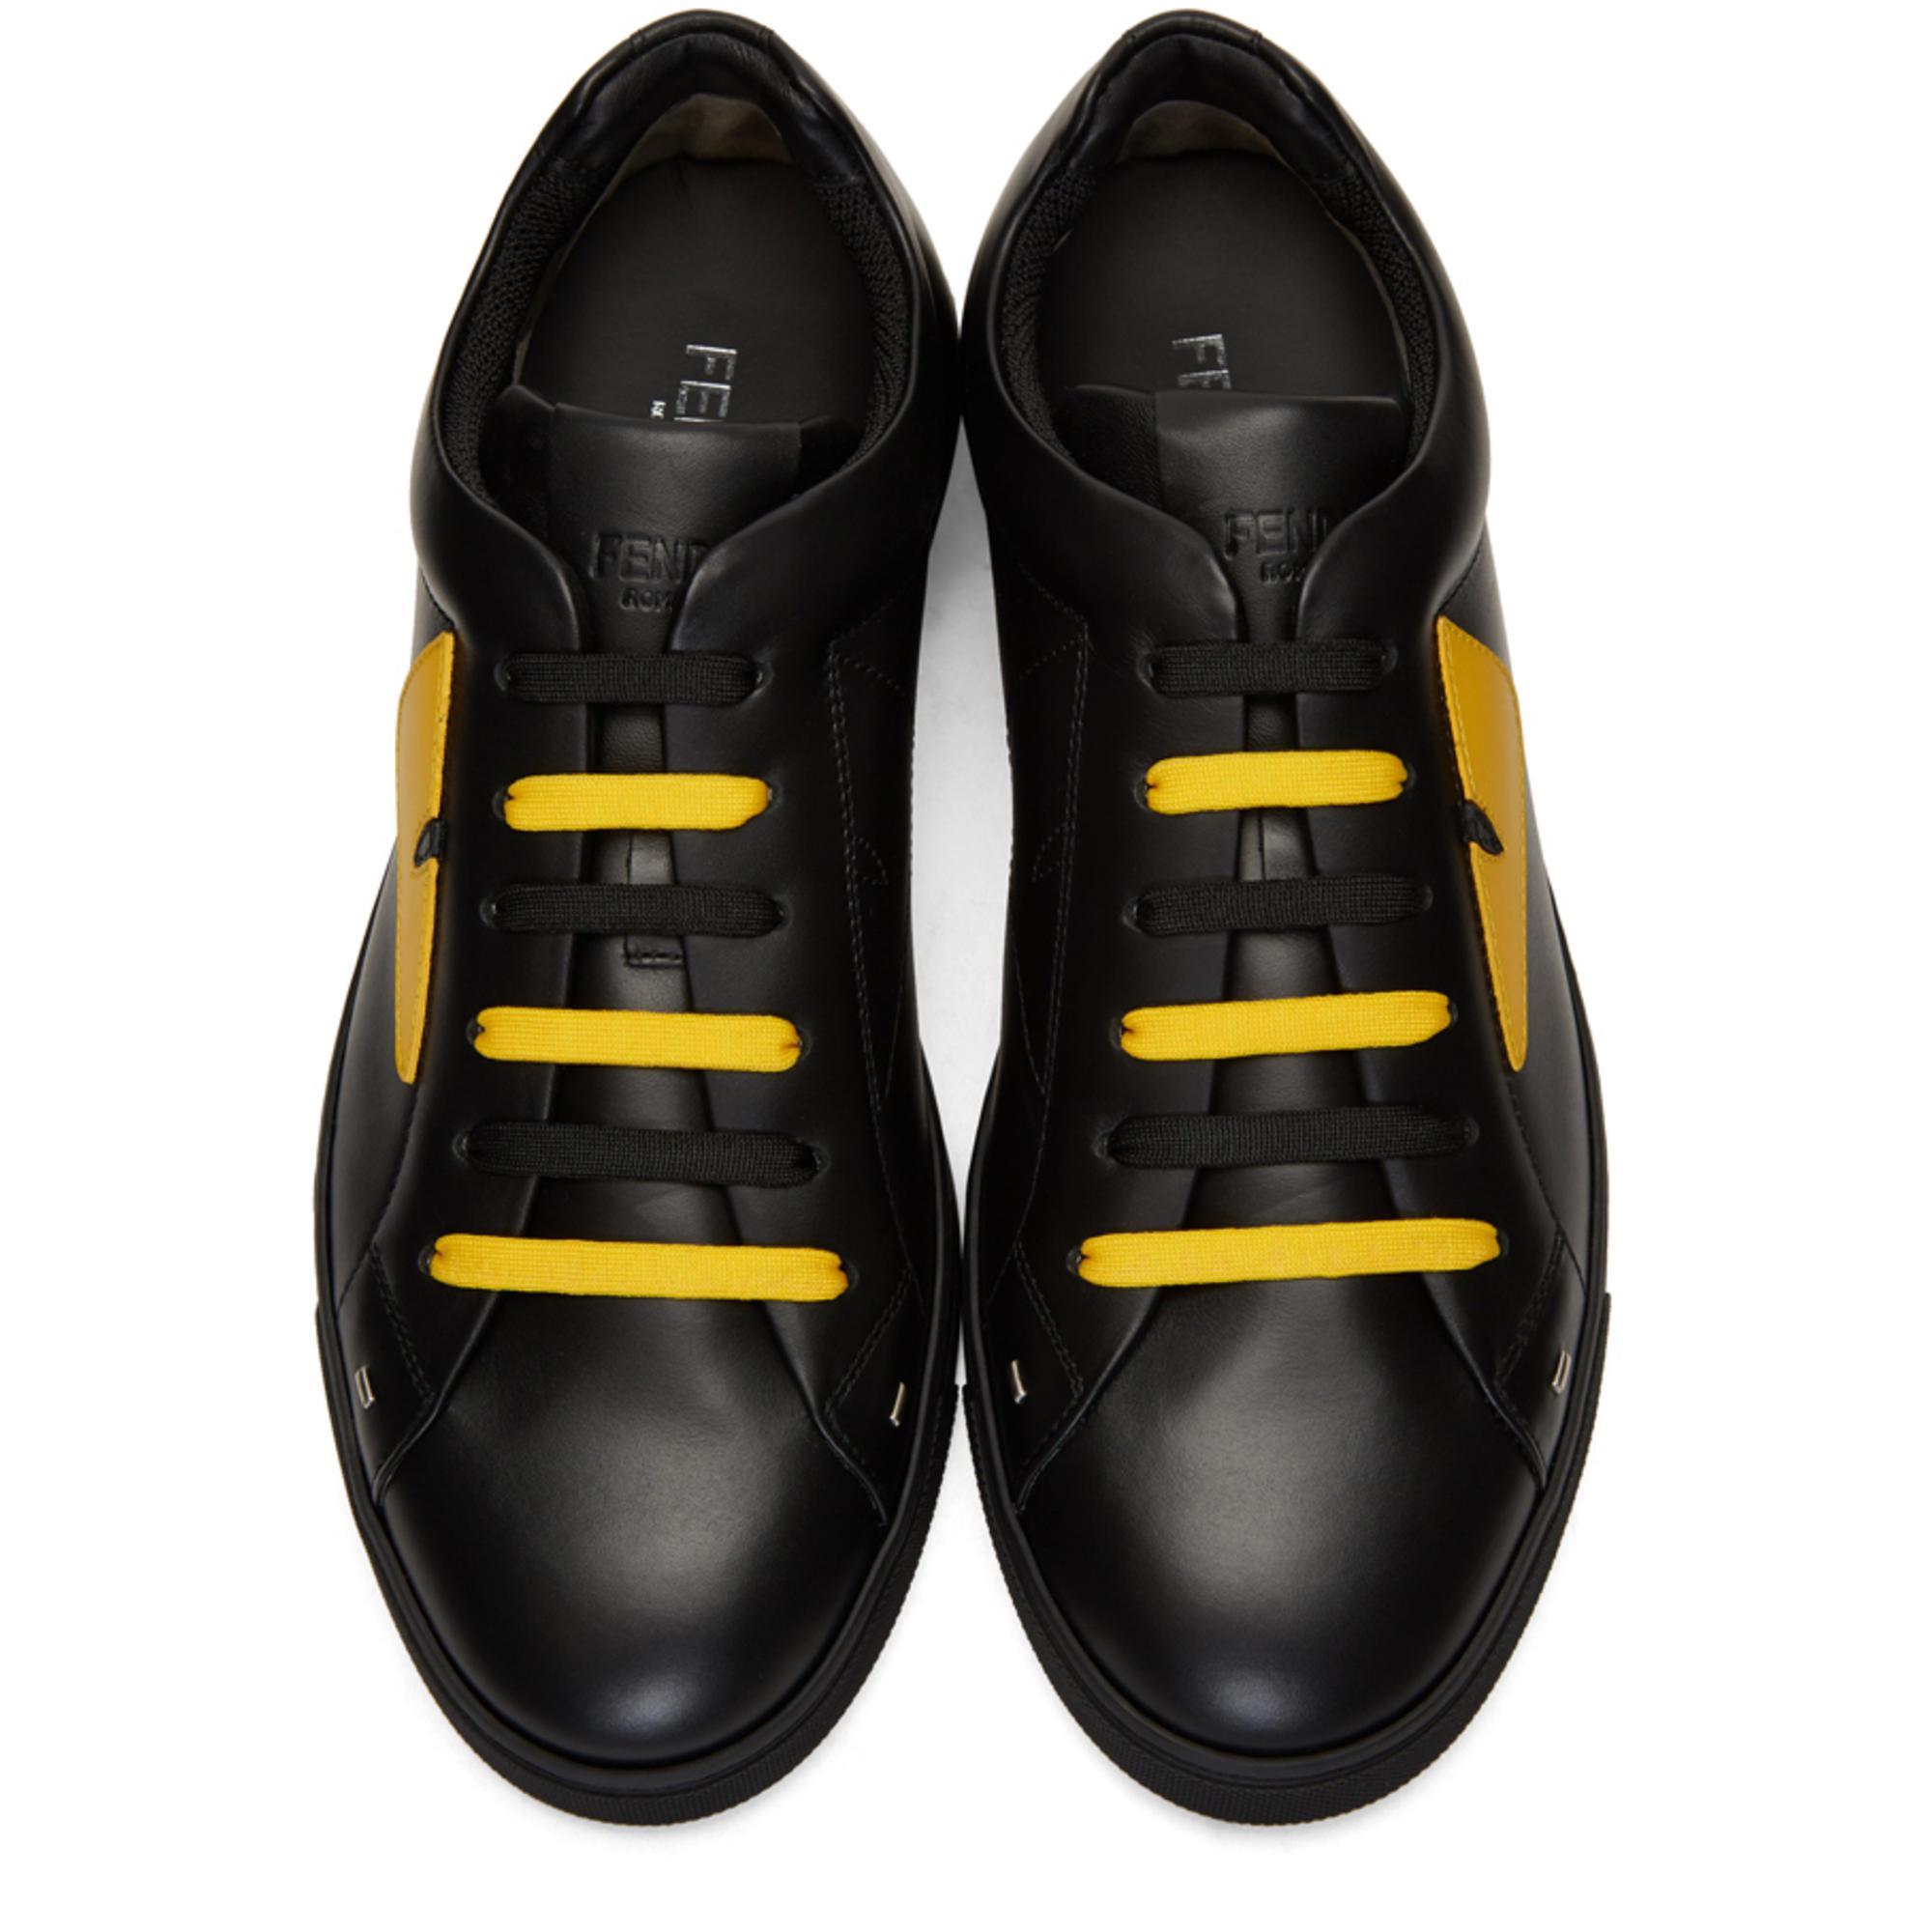 5399579a Fendi Black & Yellow 'bag Bugs' Sneakers for men